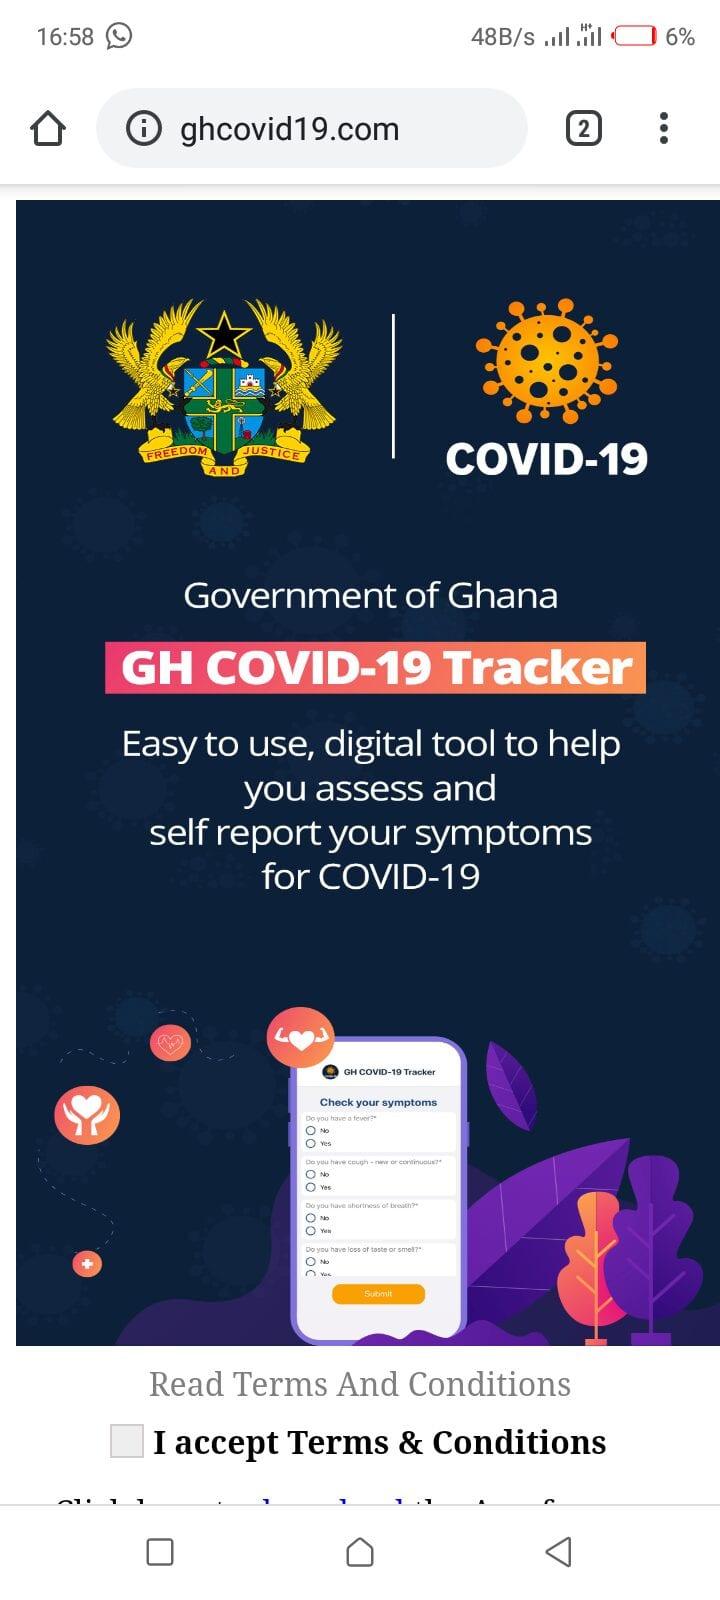 Gh Covid19 Tracker app